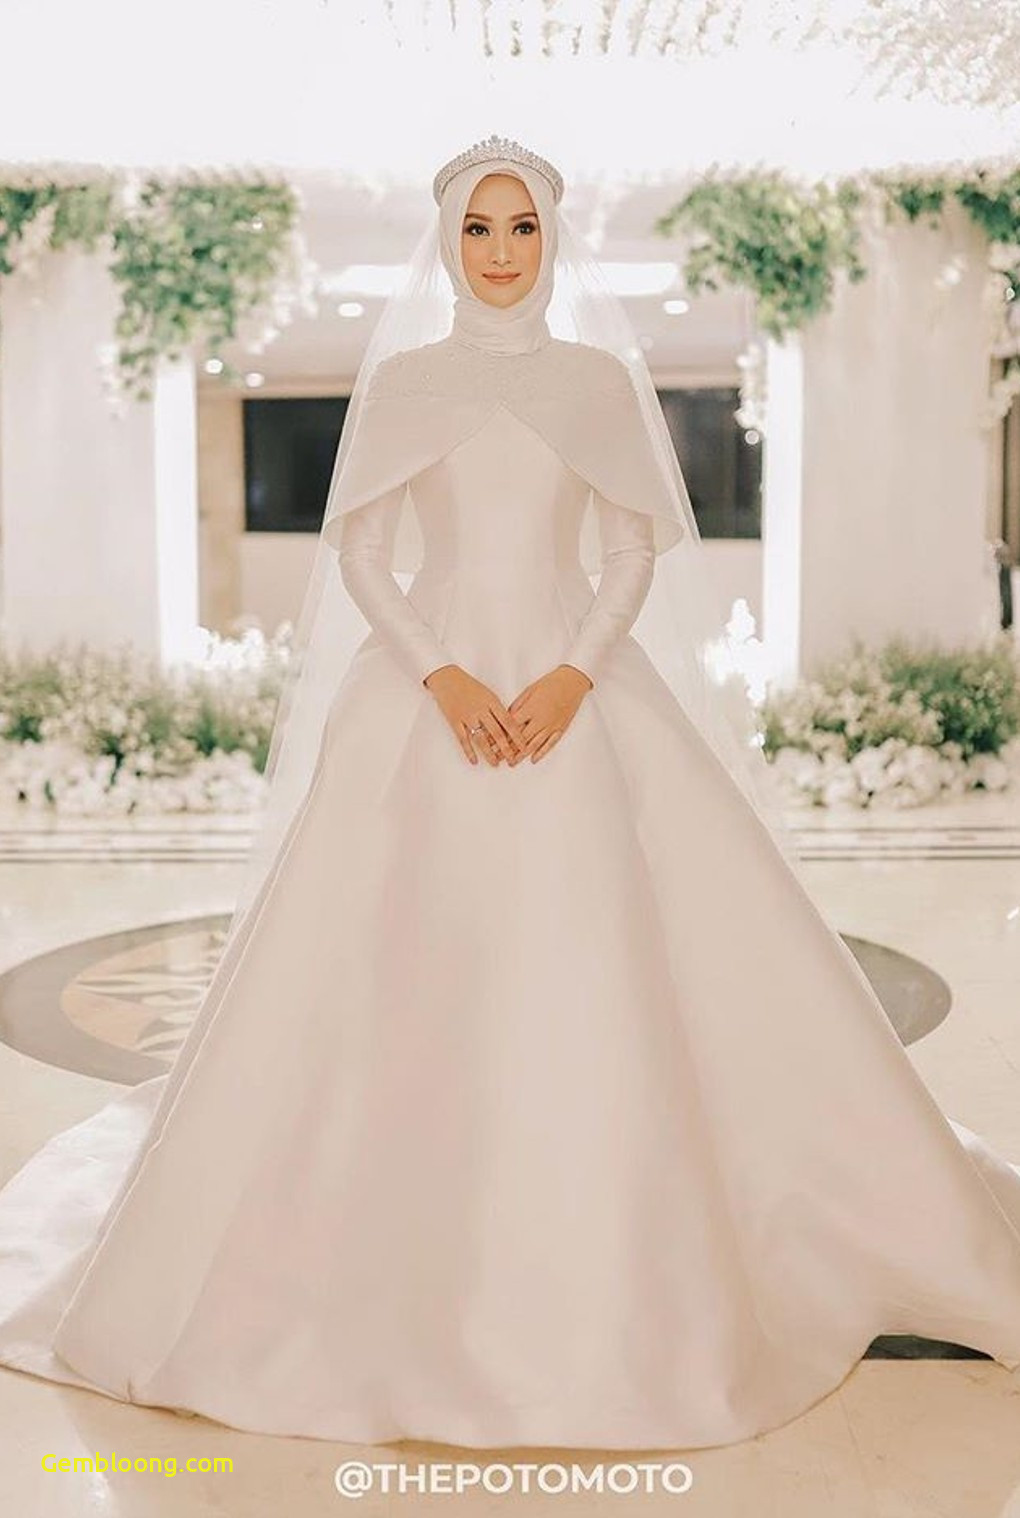 Gaun Sederhana Pengantin Berhijab Lovely 20 Inspirasi Gaun Pernikahan Untuk Calon Pengantin Berhijab